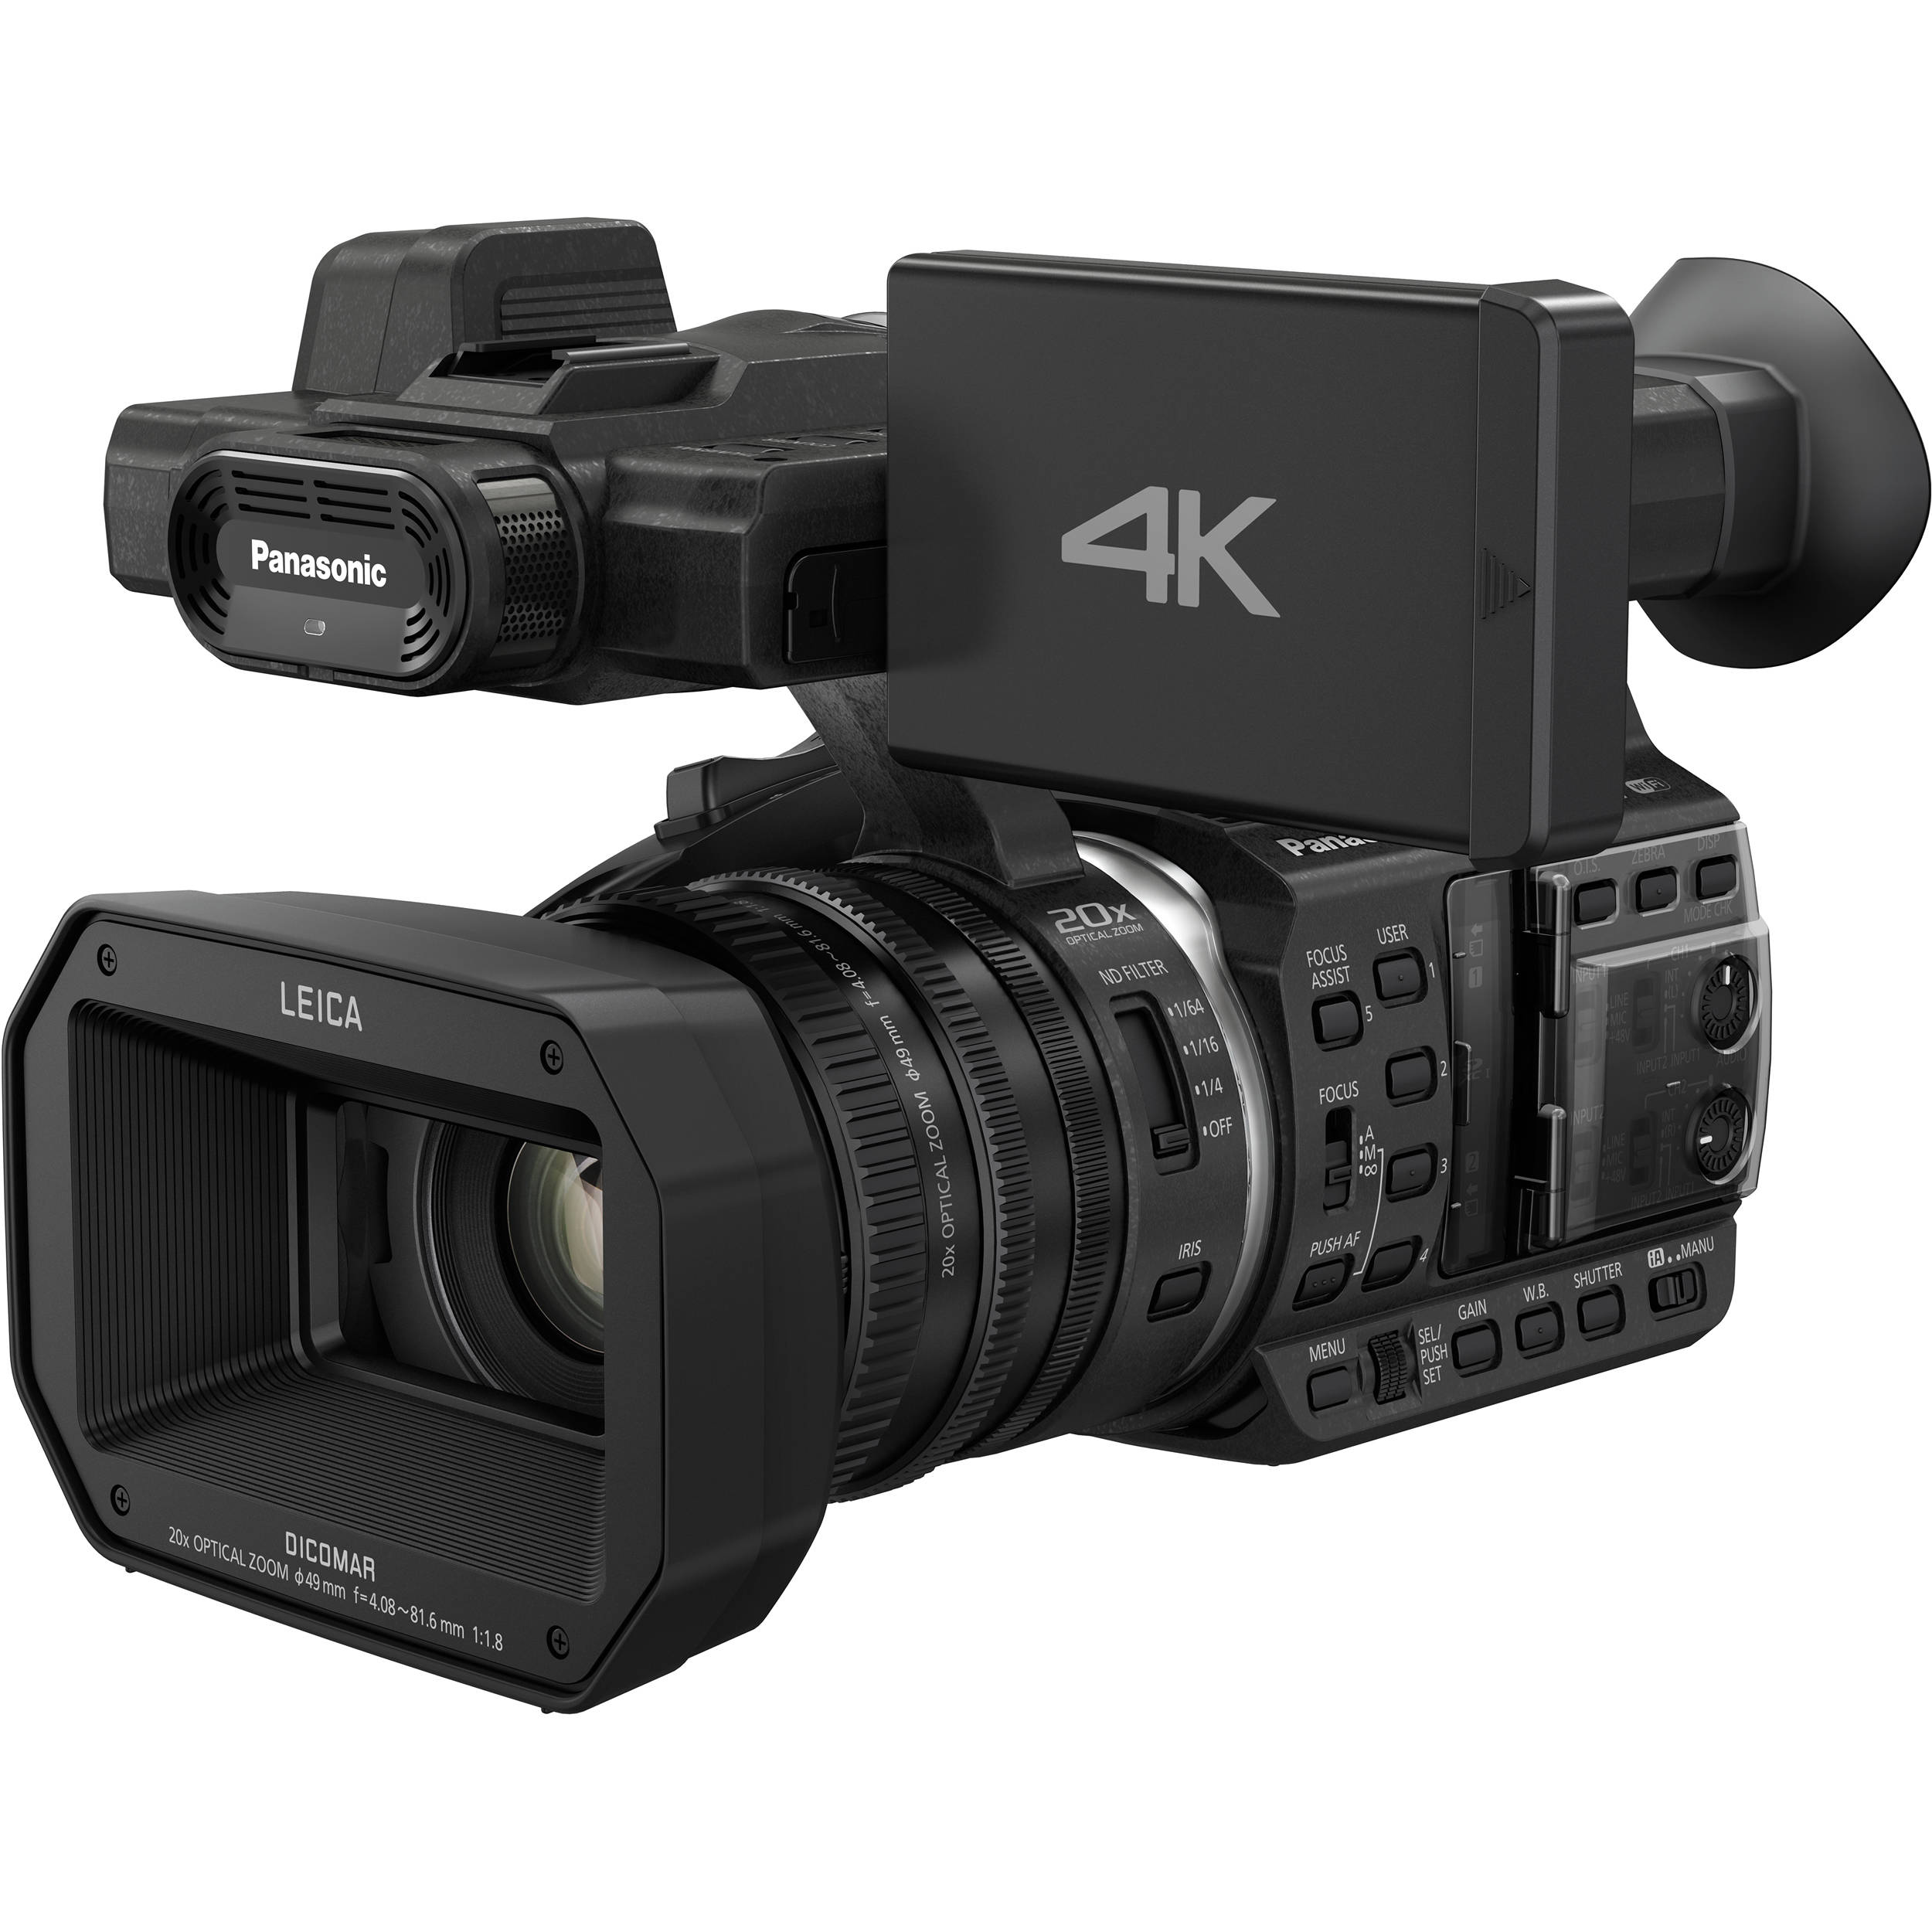 camera hd 4k